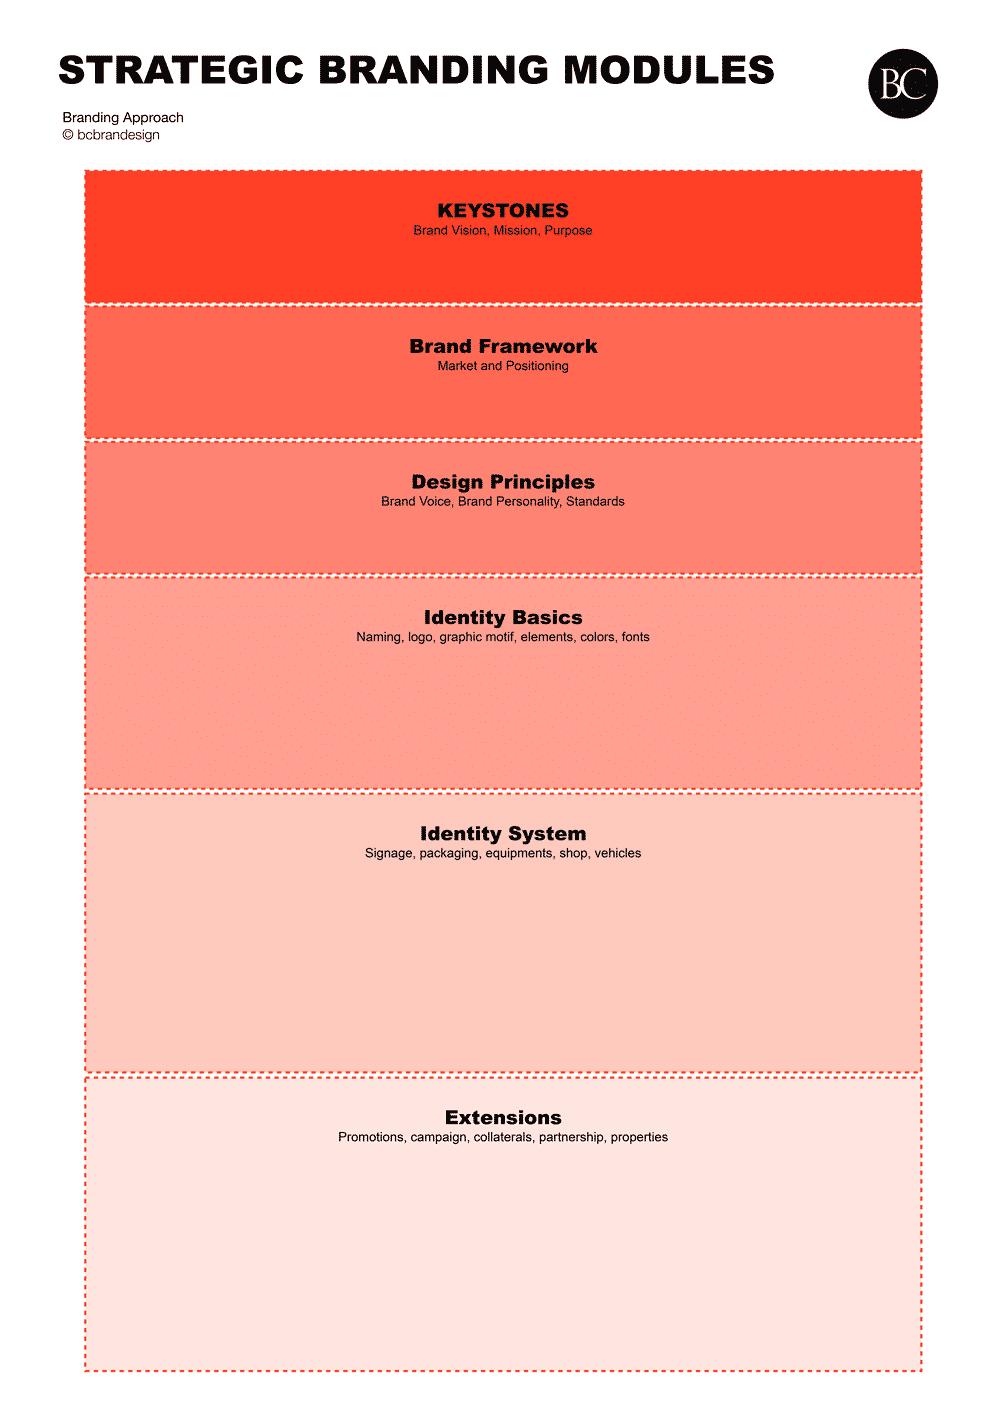 Strategic-Branding-Modules_Strategic-Branding_bcbrandesign